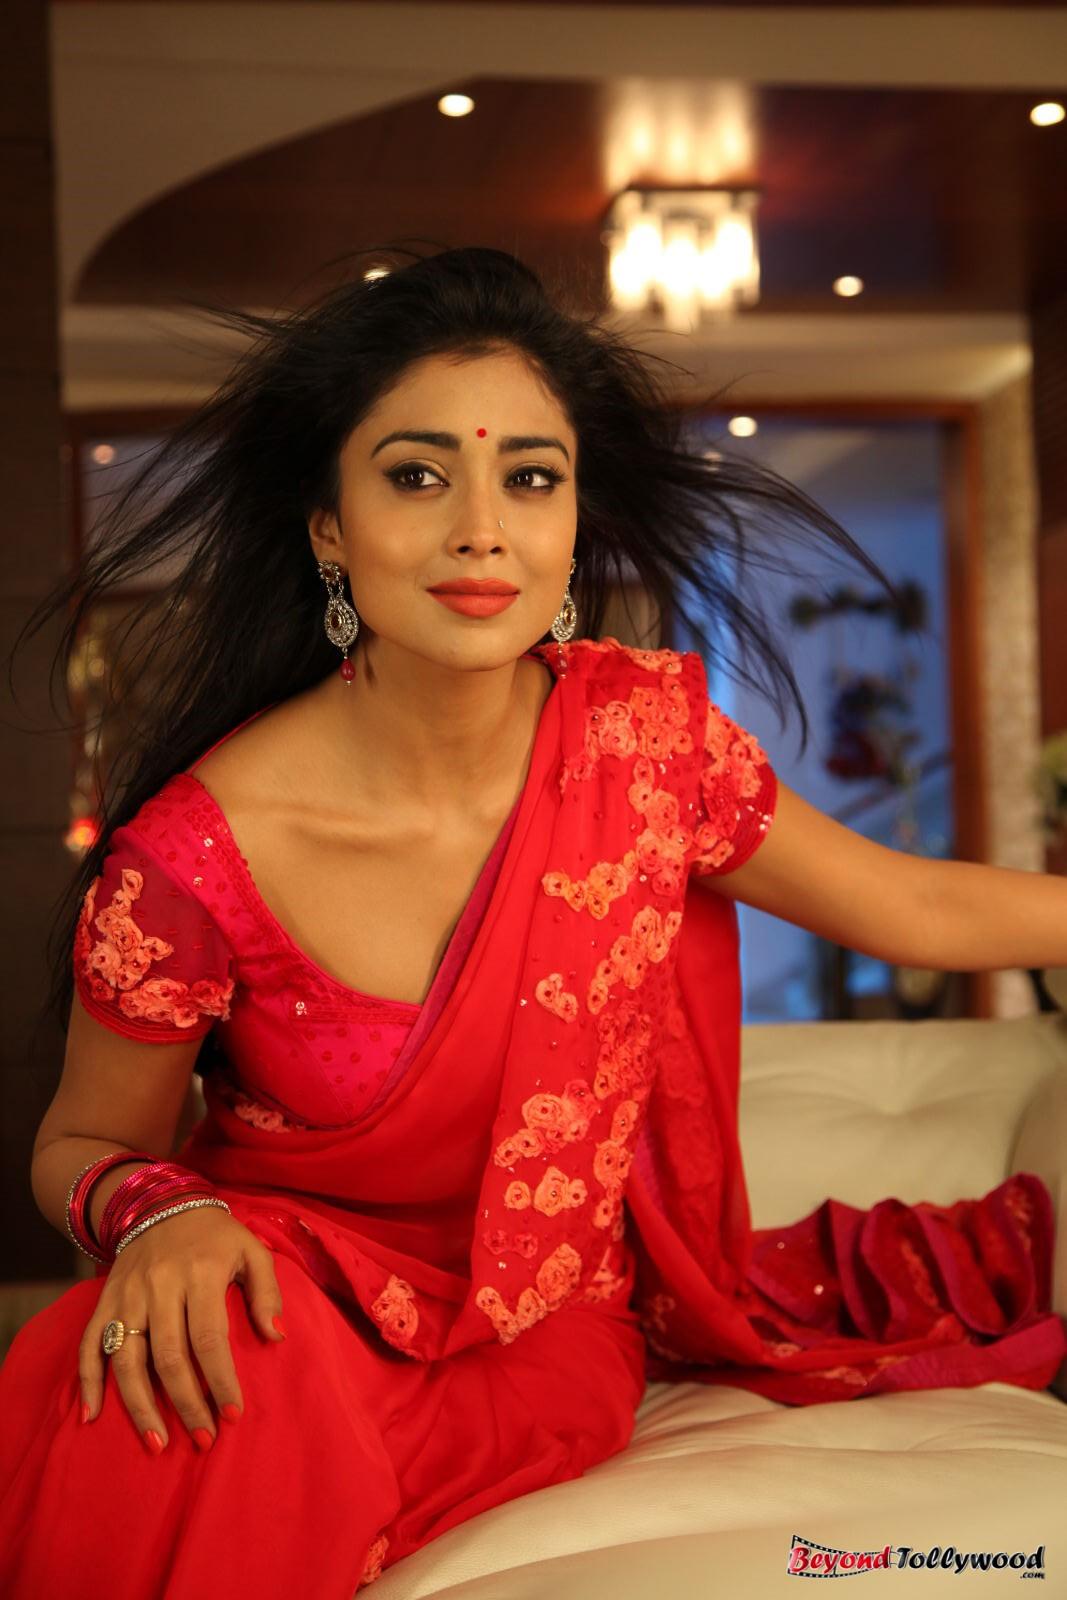 Nayanthara hot etotic movie scenes collection - 3 1